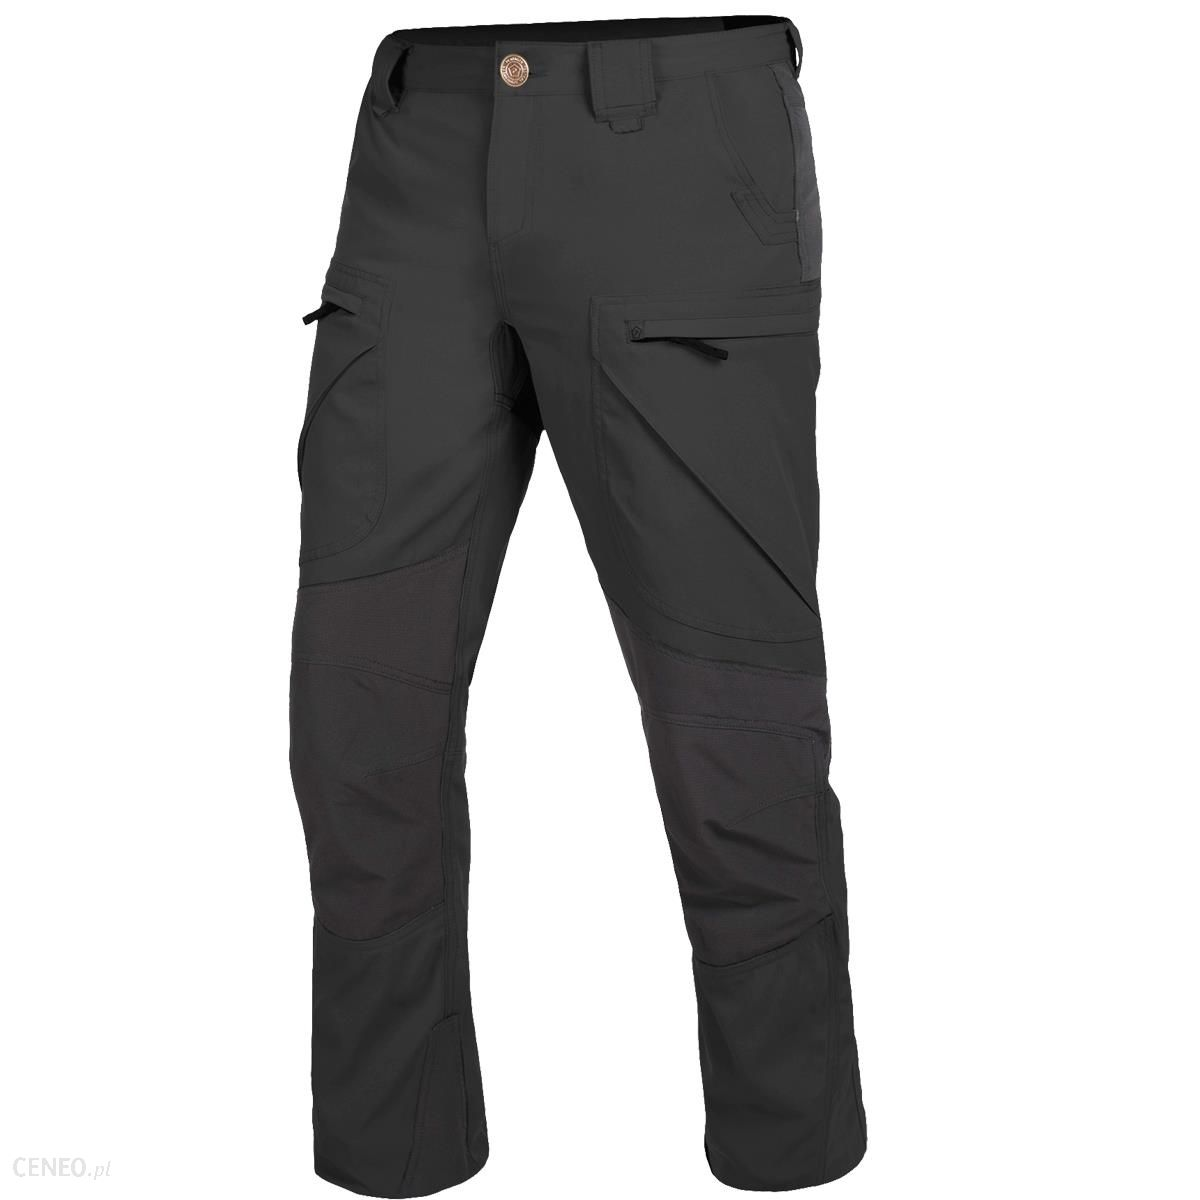 Spodnie Pentagon Vorras Climbing Czarne